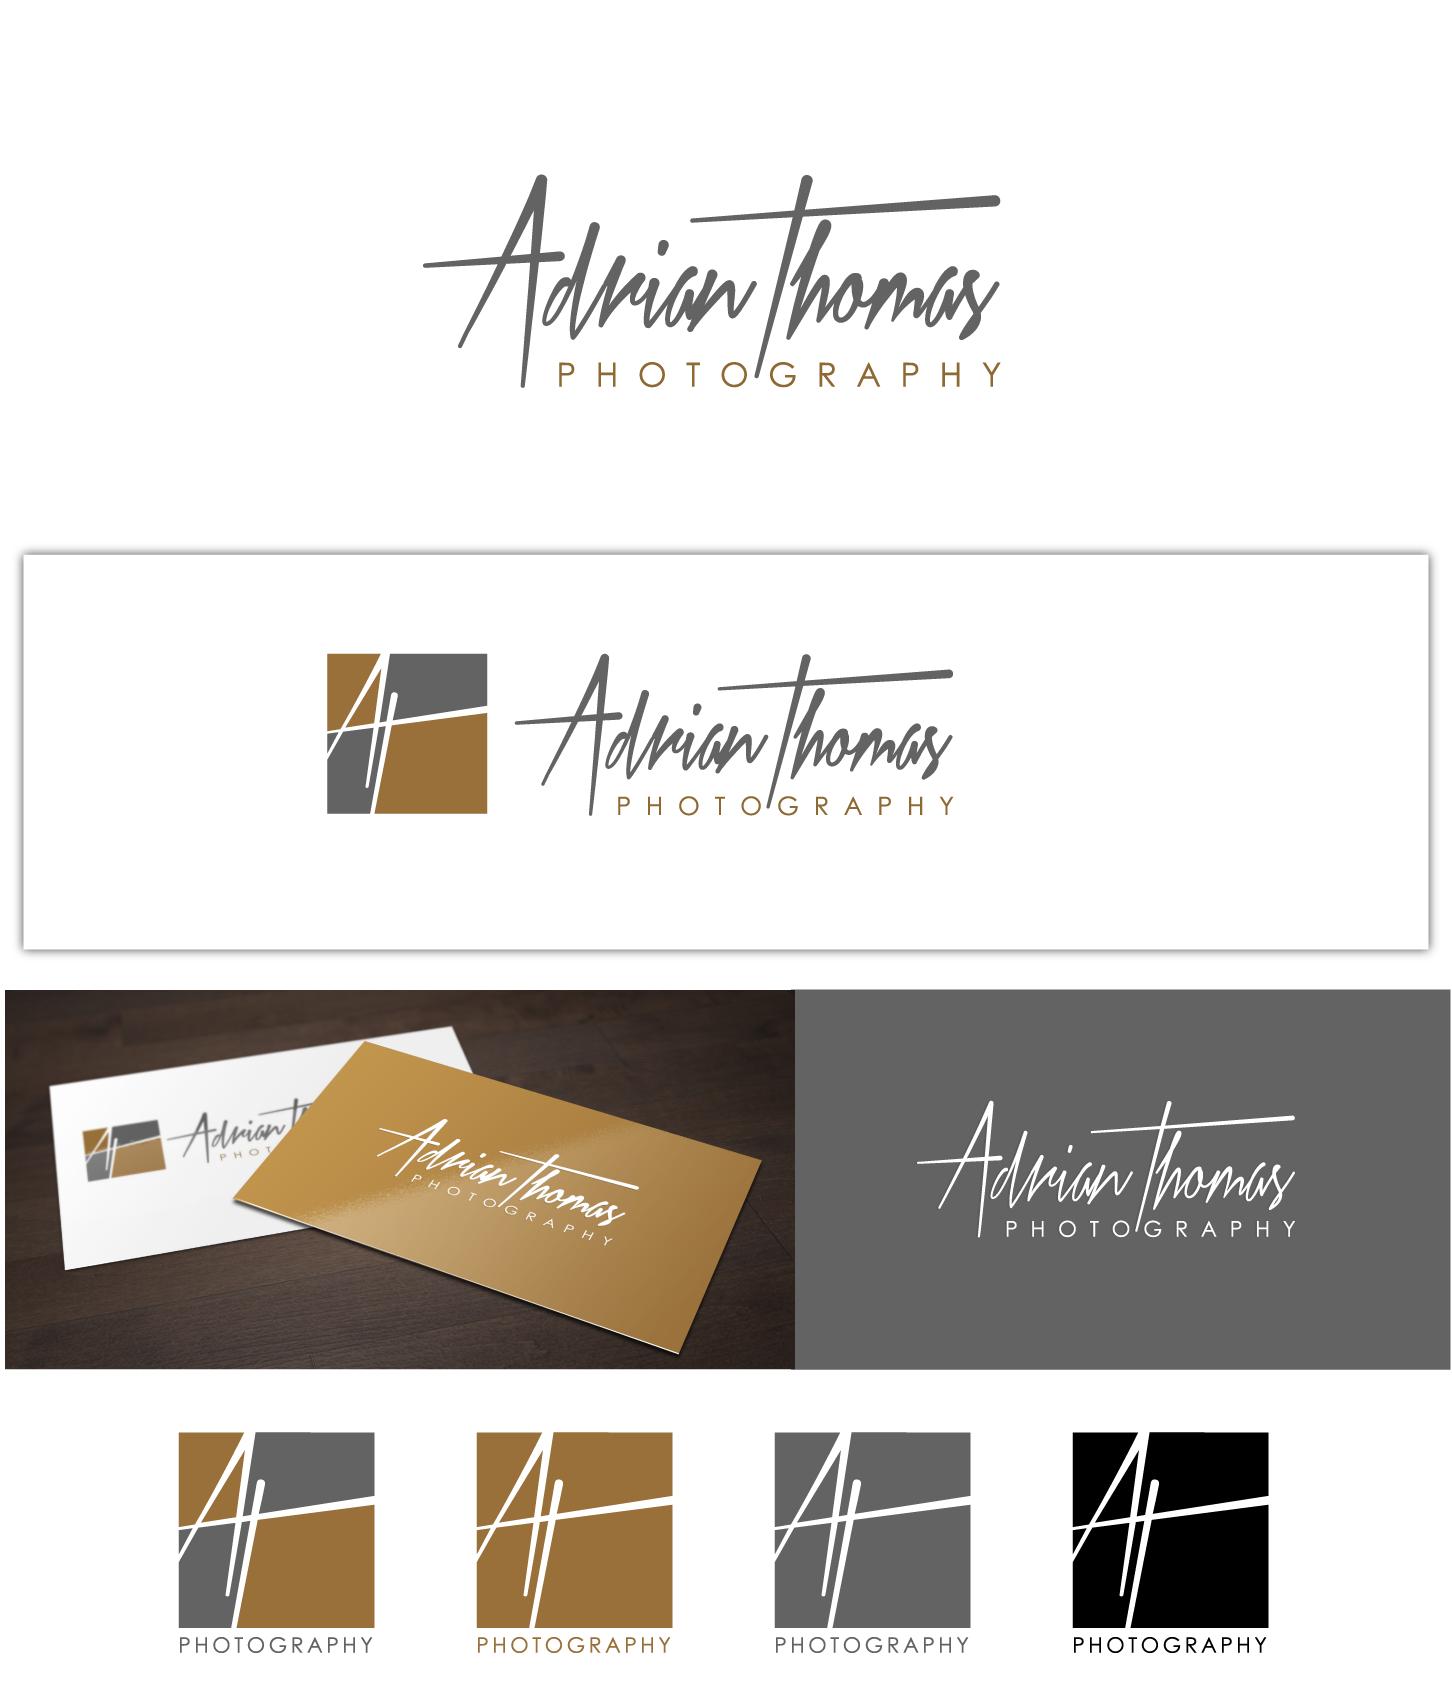 New design Logo for Adrian Thomas Photography